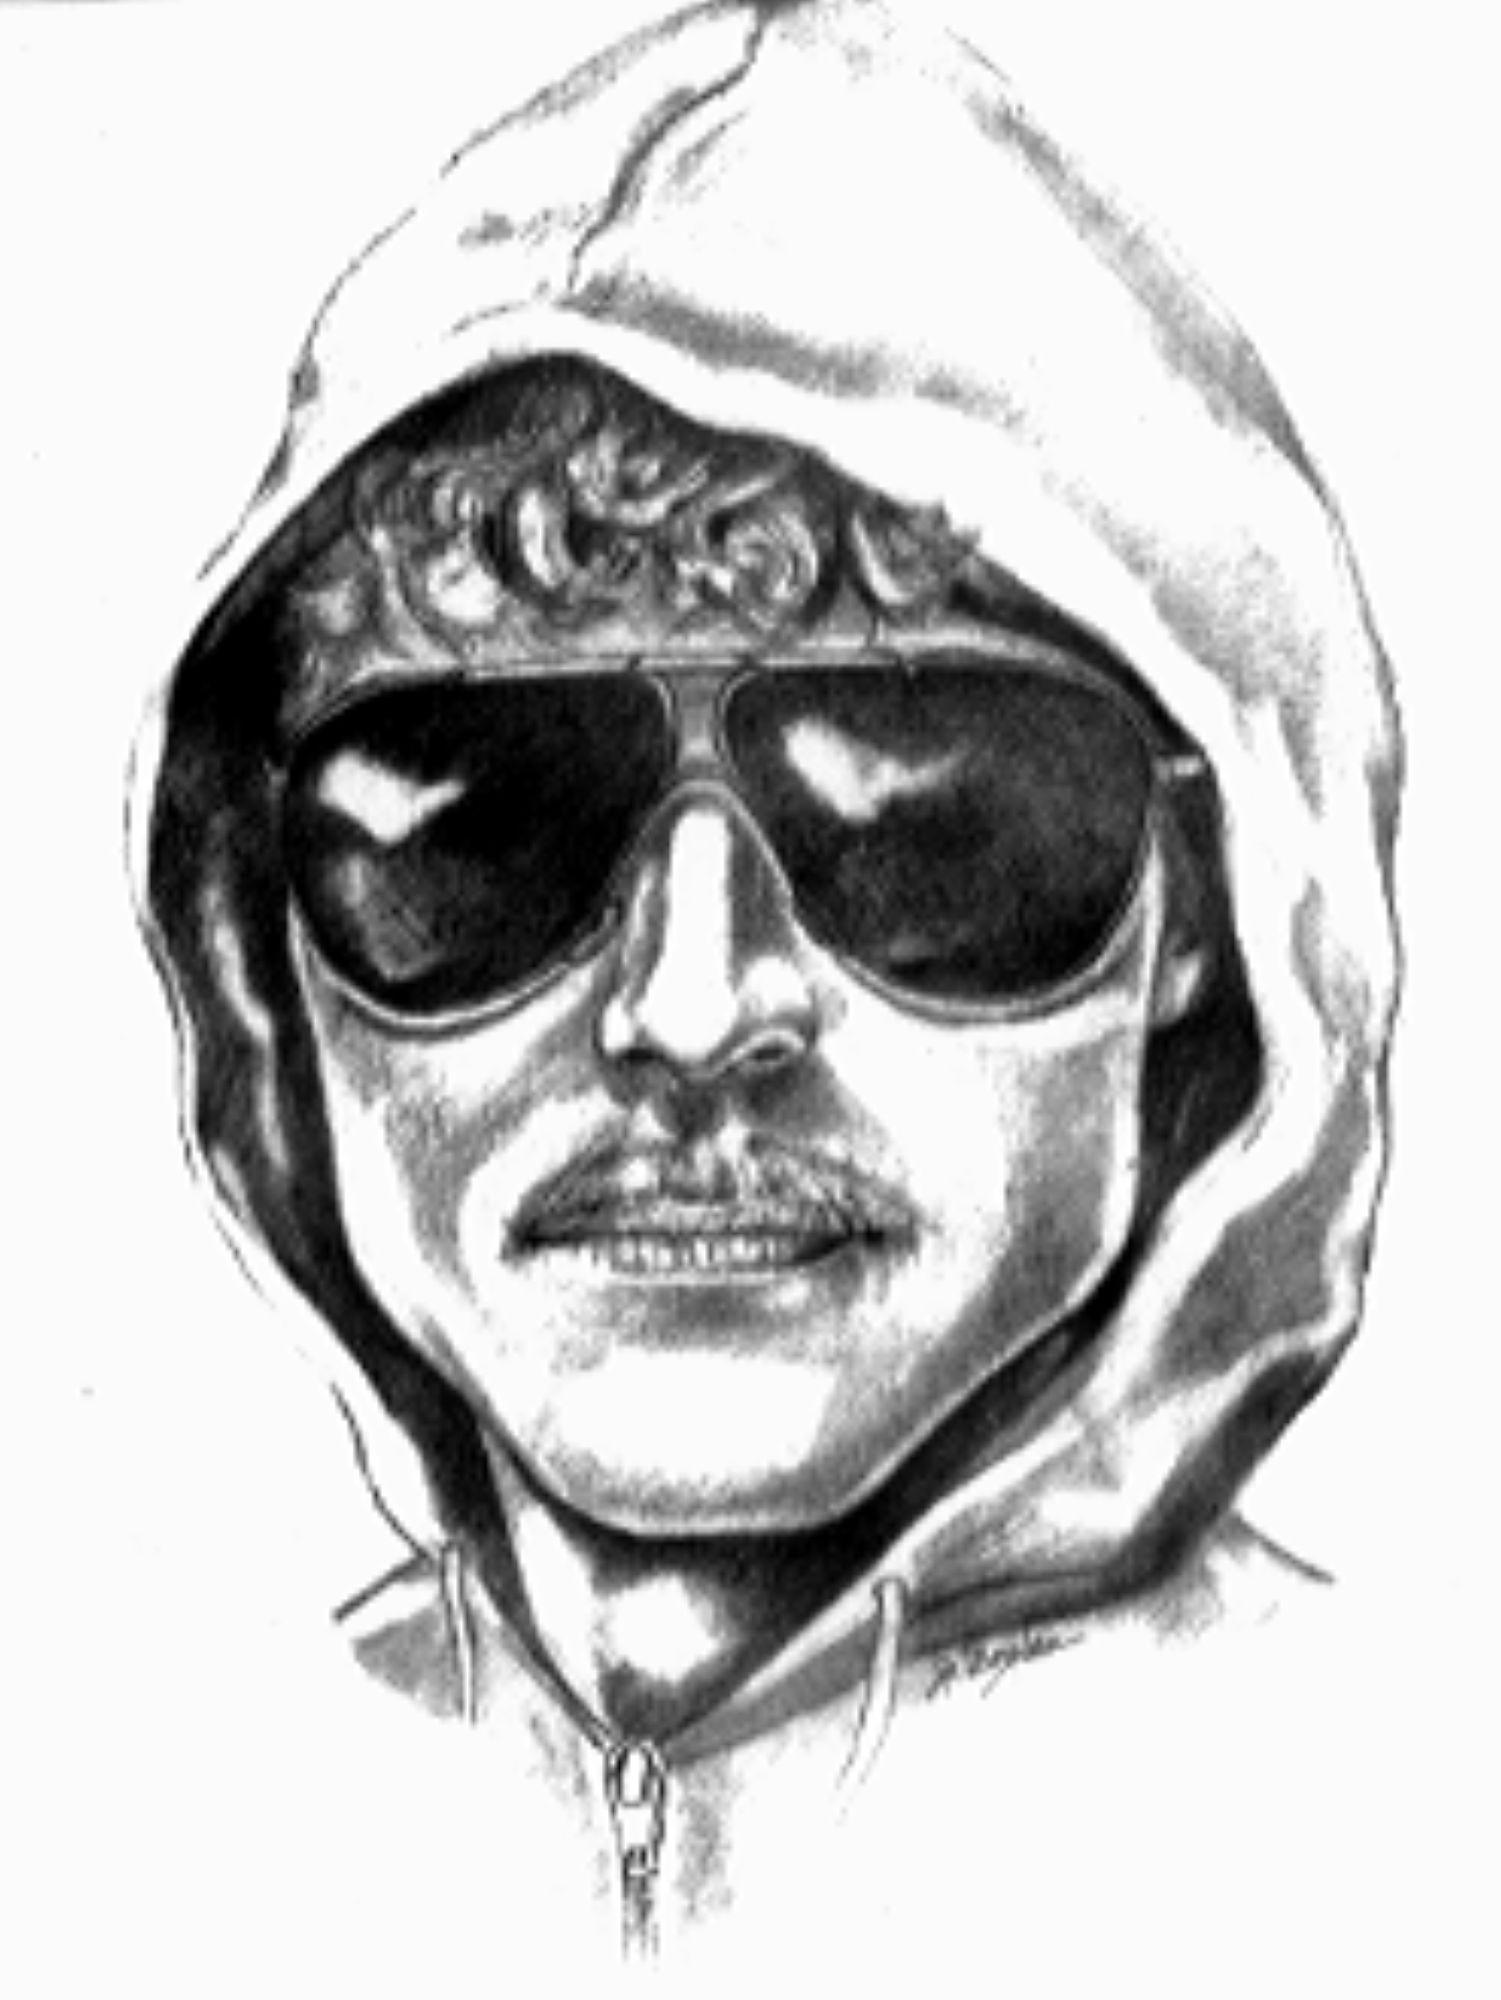 02-Unabomber-sketch